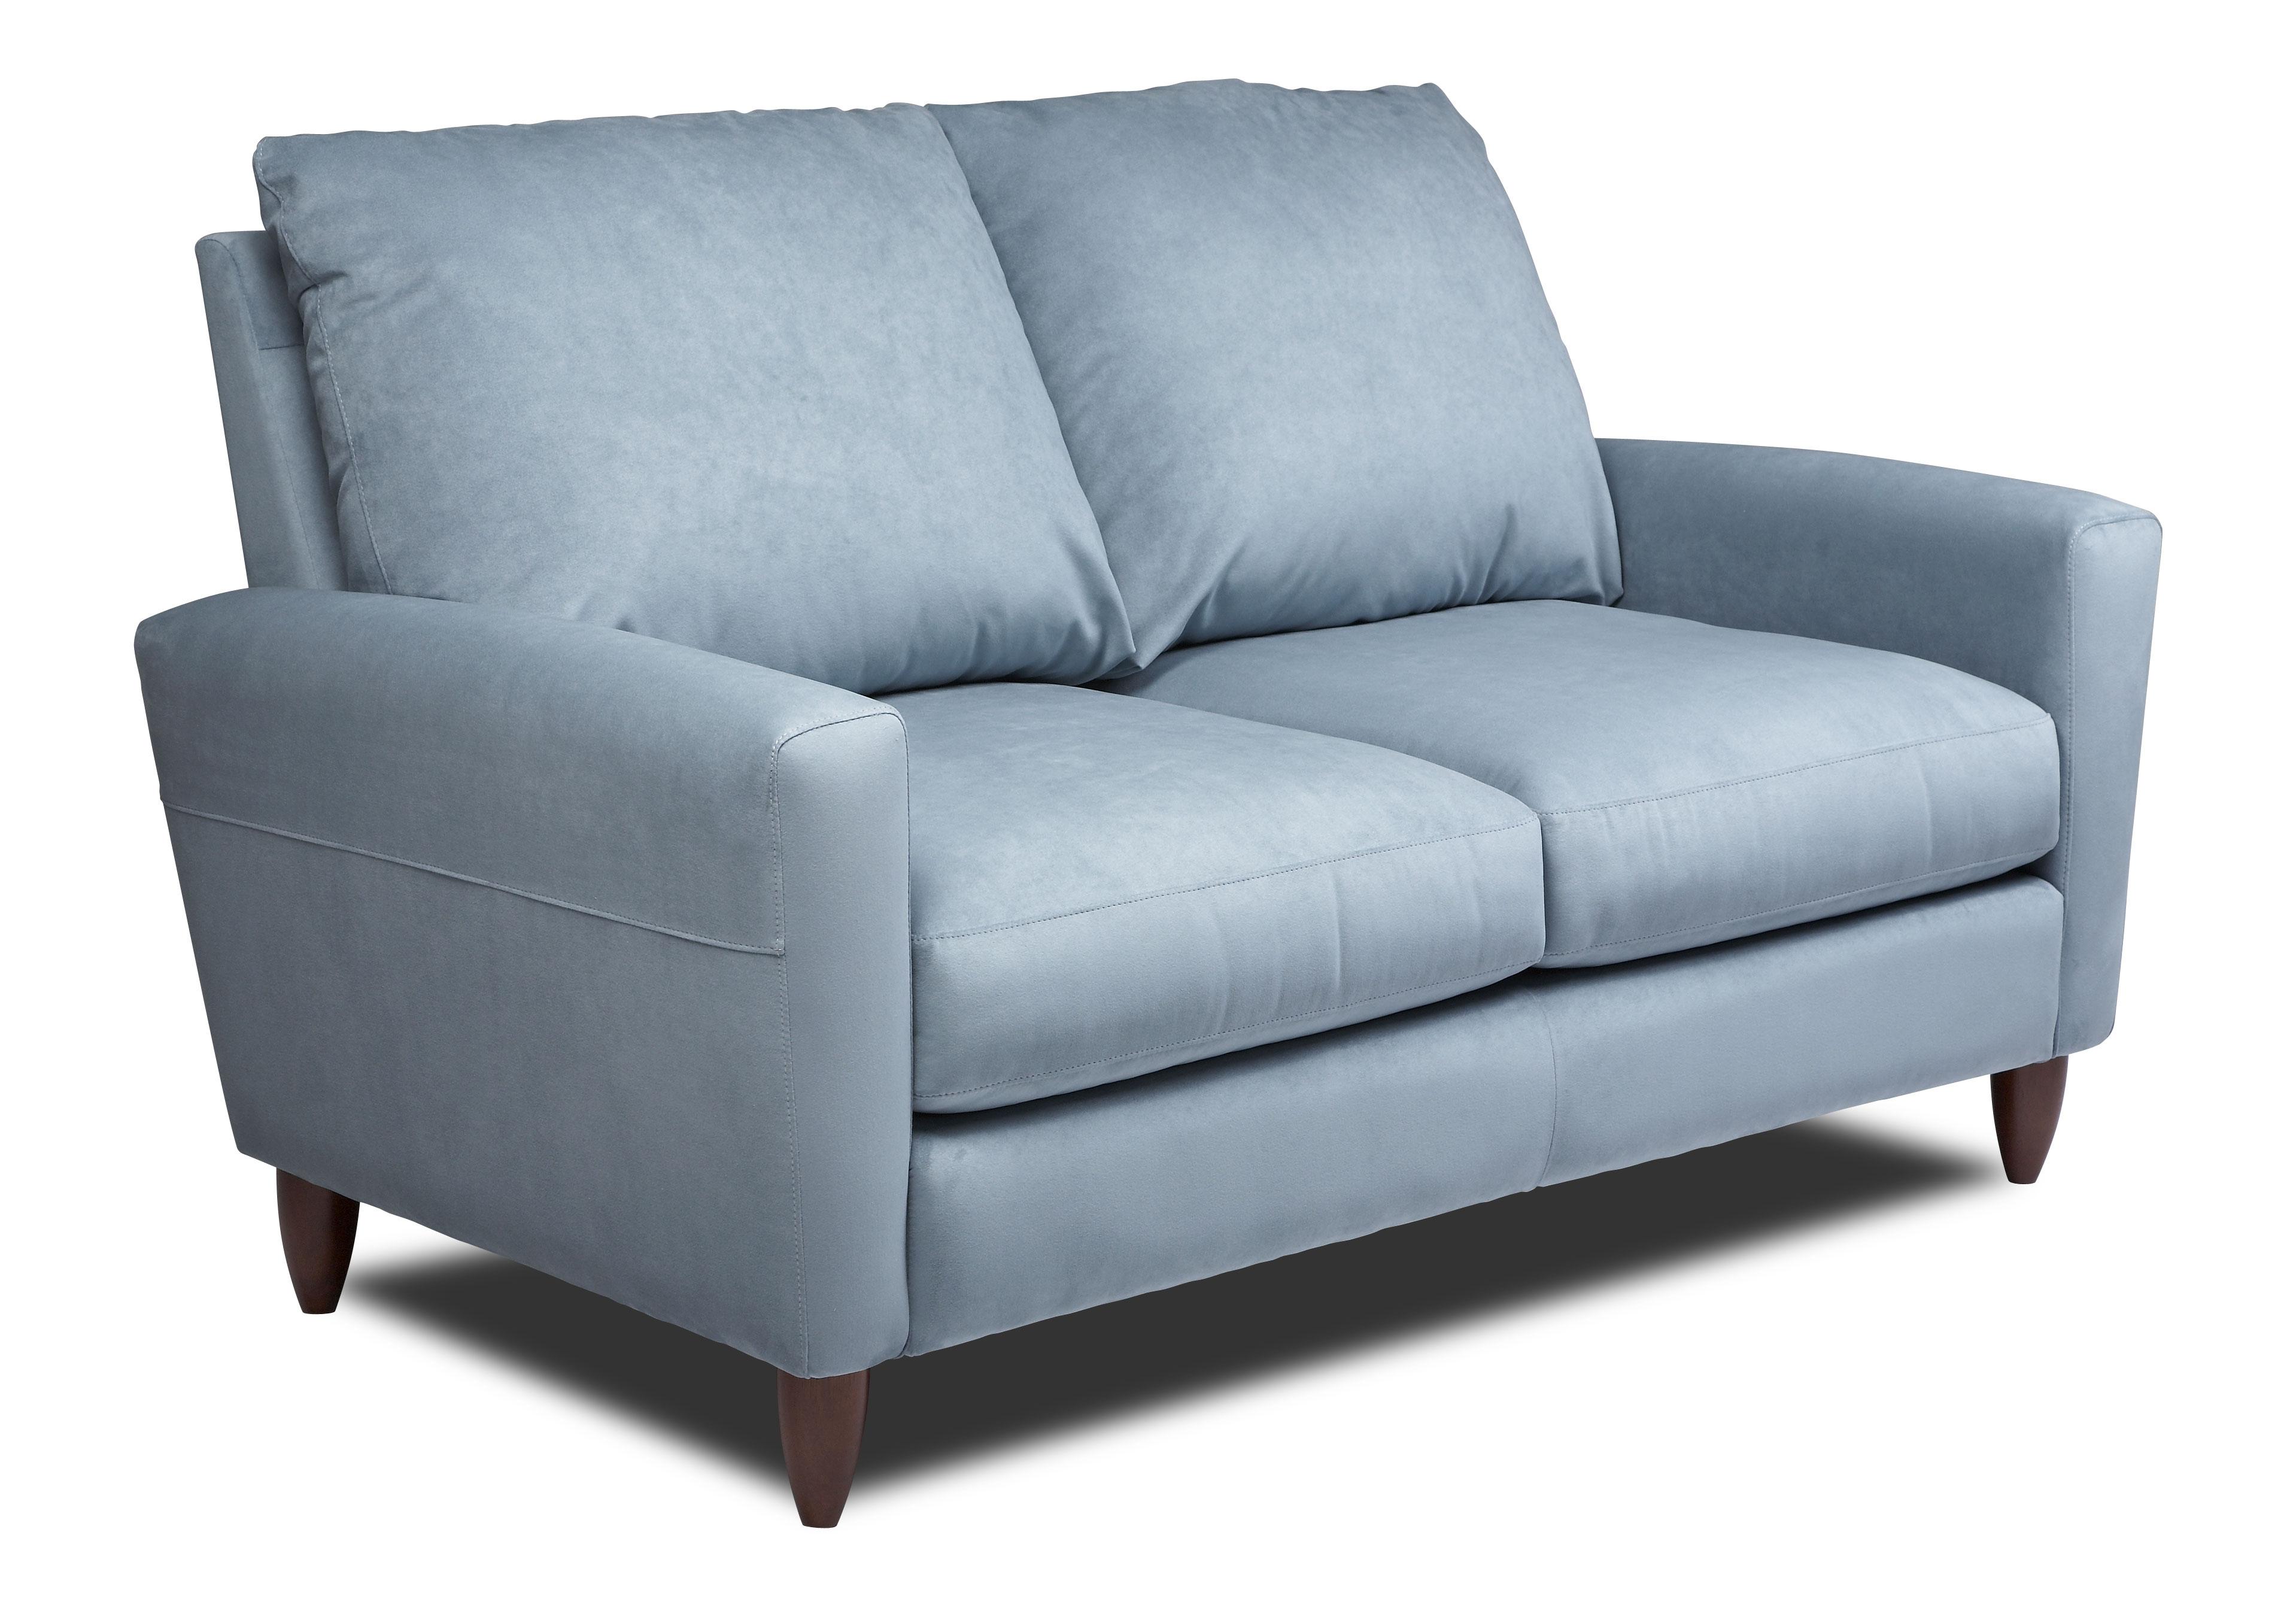 Circle Furniture Simon Swivel Chair